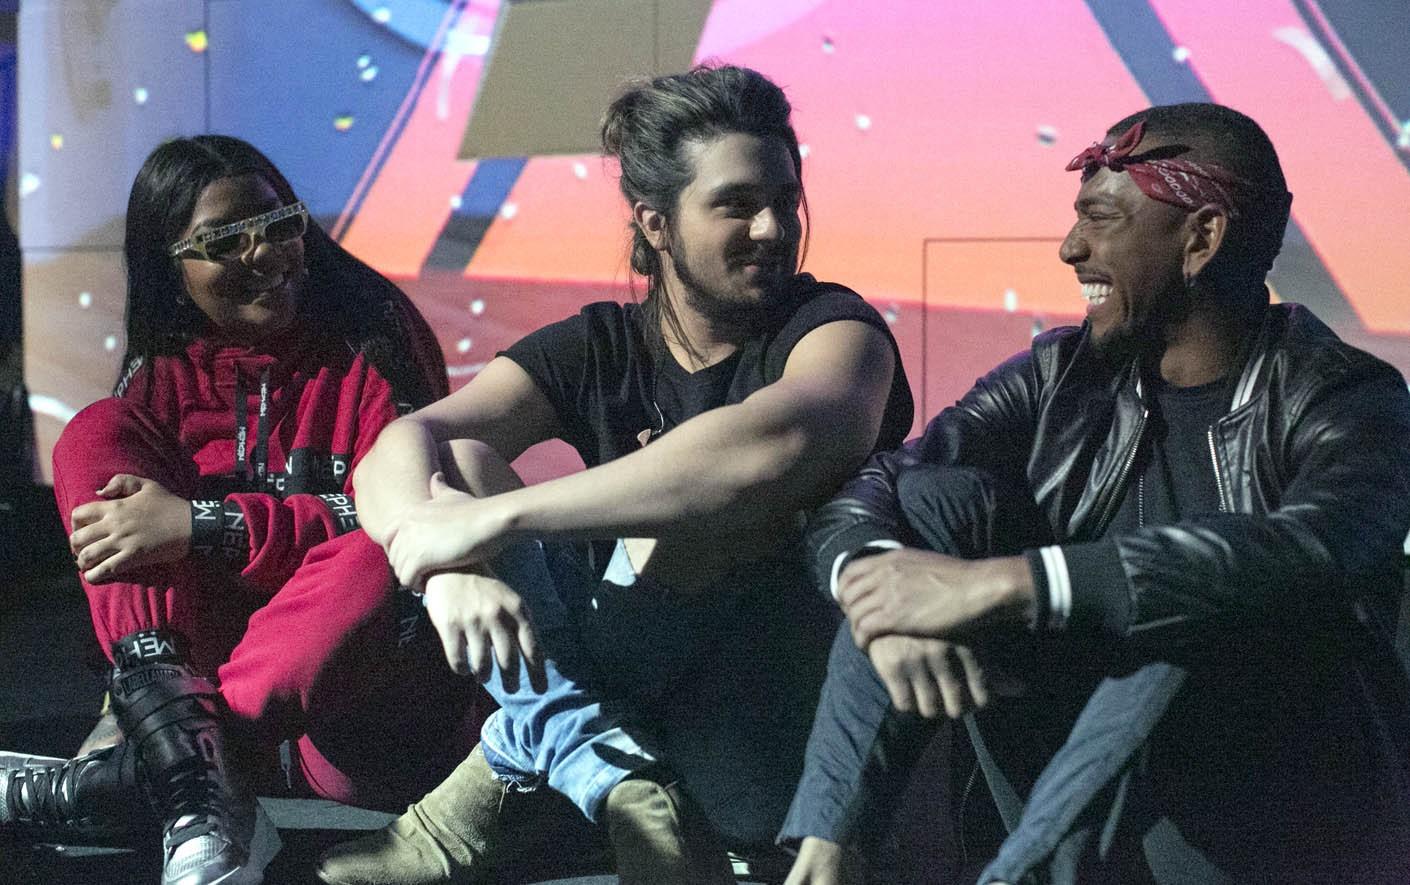 ENSAIO: Luan Santana, Ludmilla e Nego do Borel (Foto: Ana Luisa Marzano / Multishow)